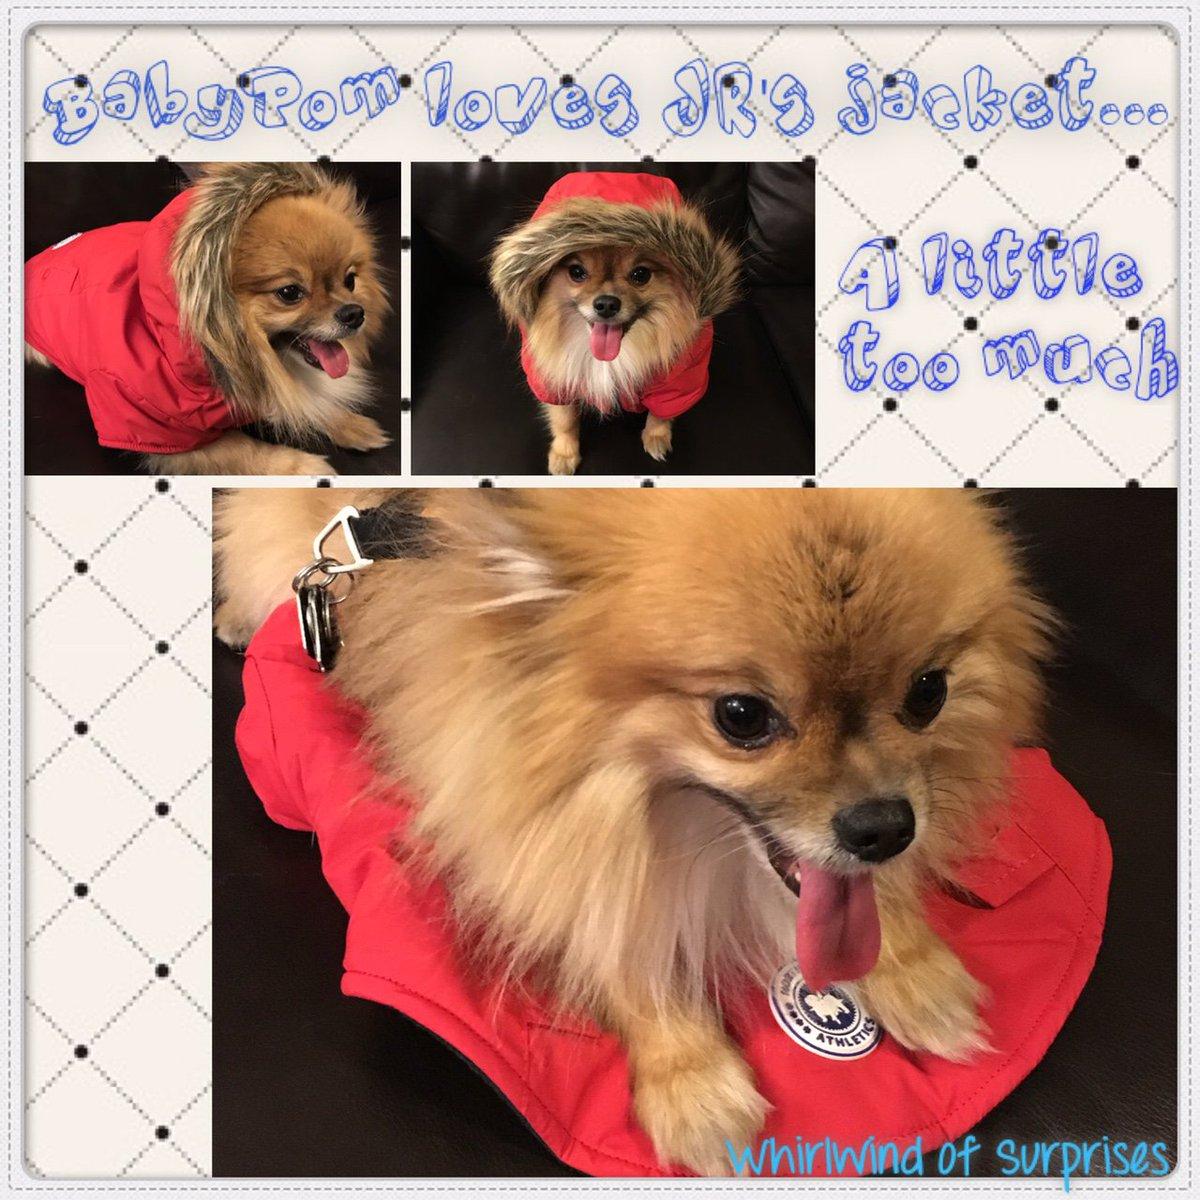 affordable quality dog jackets